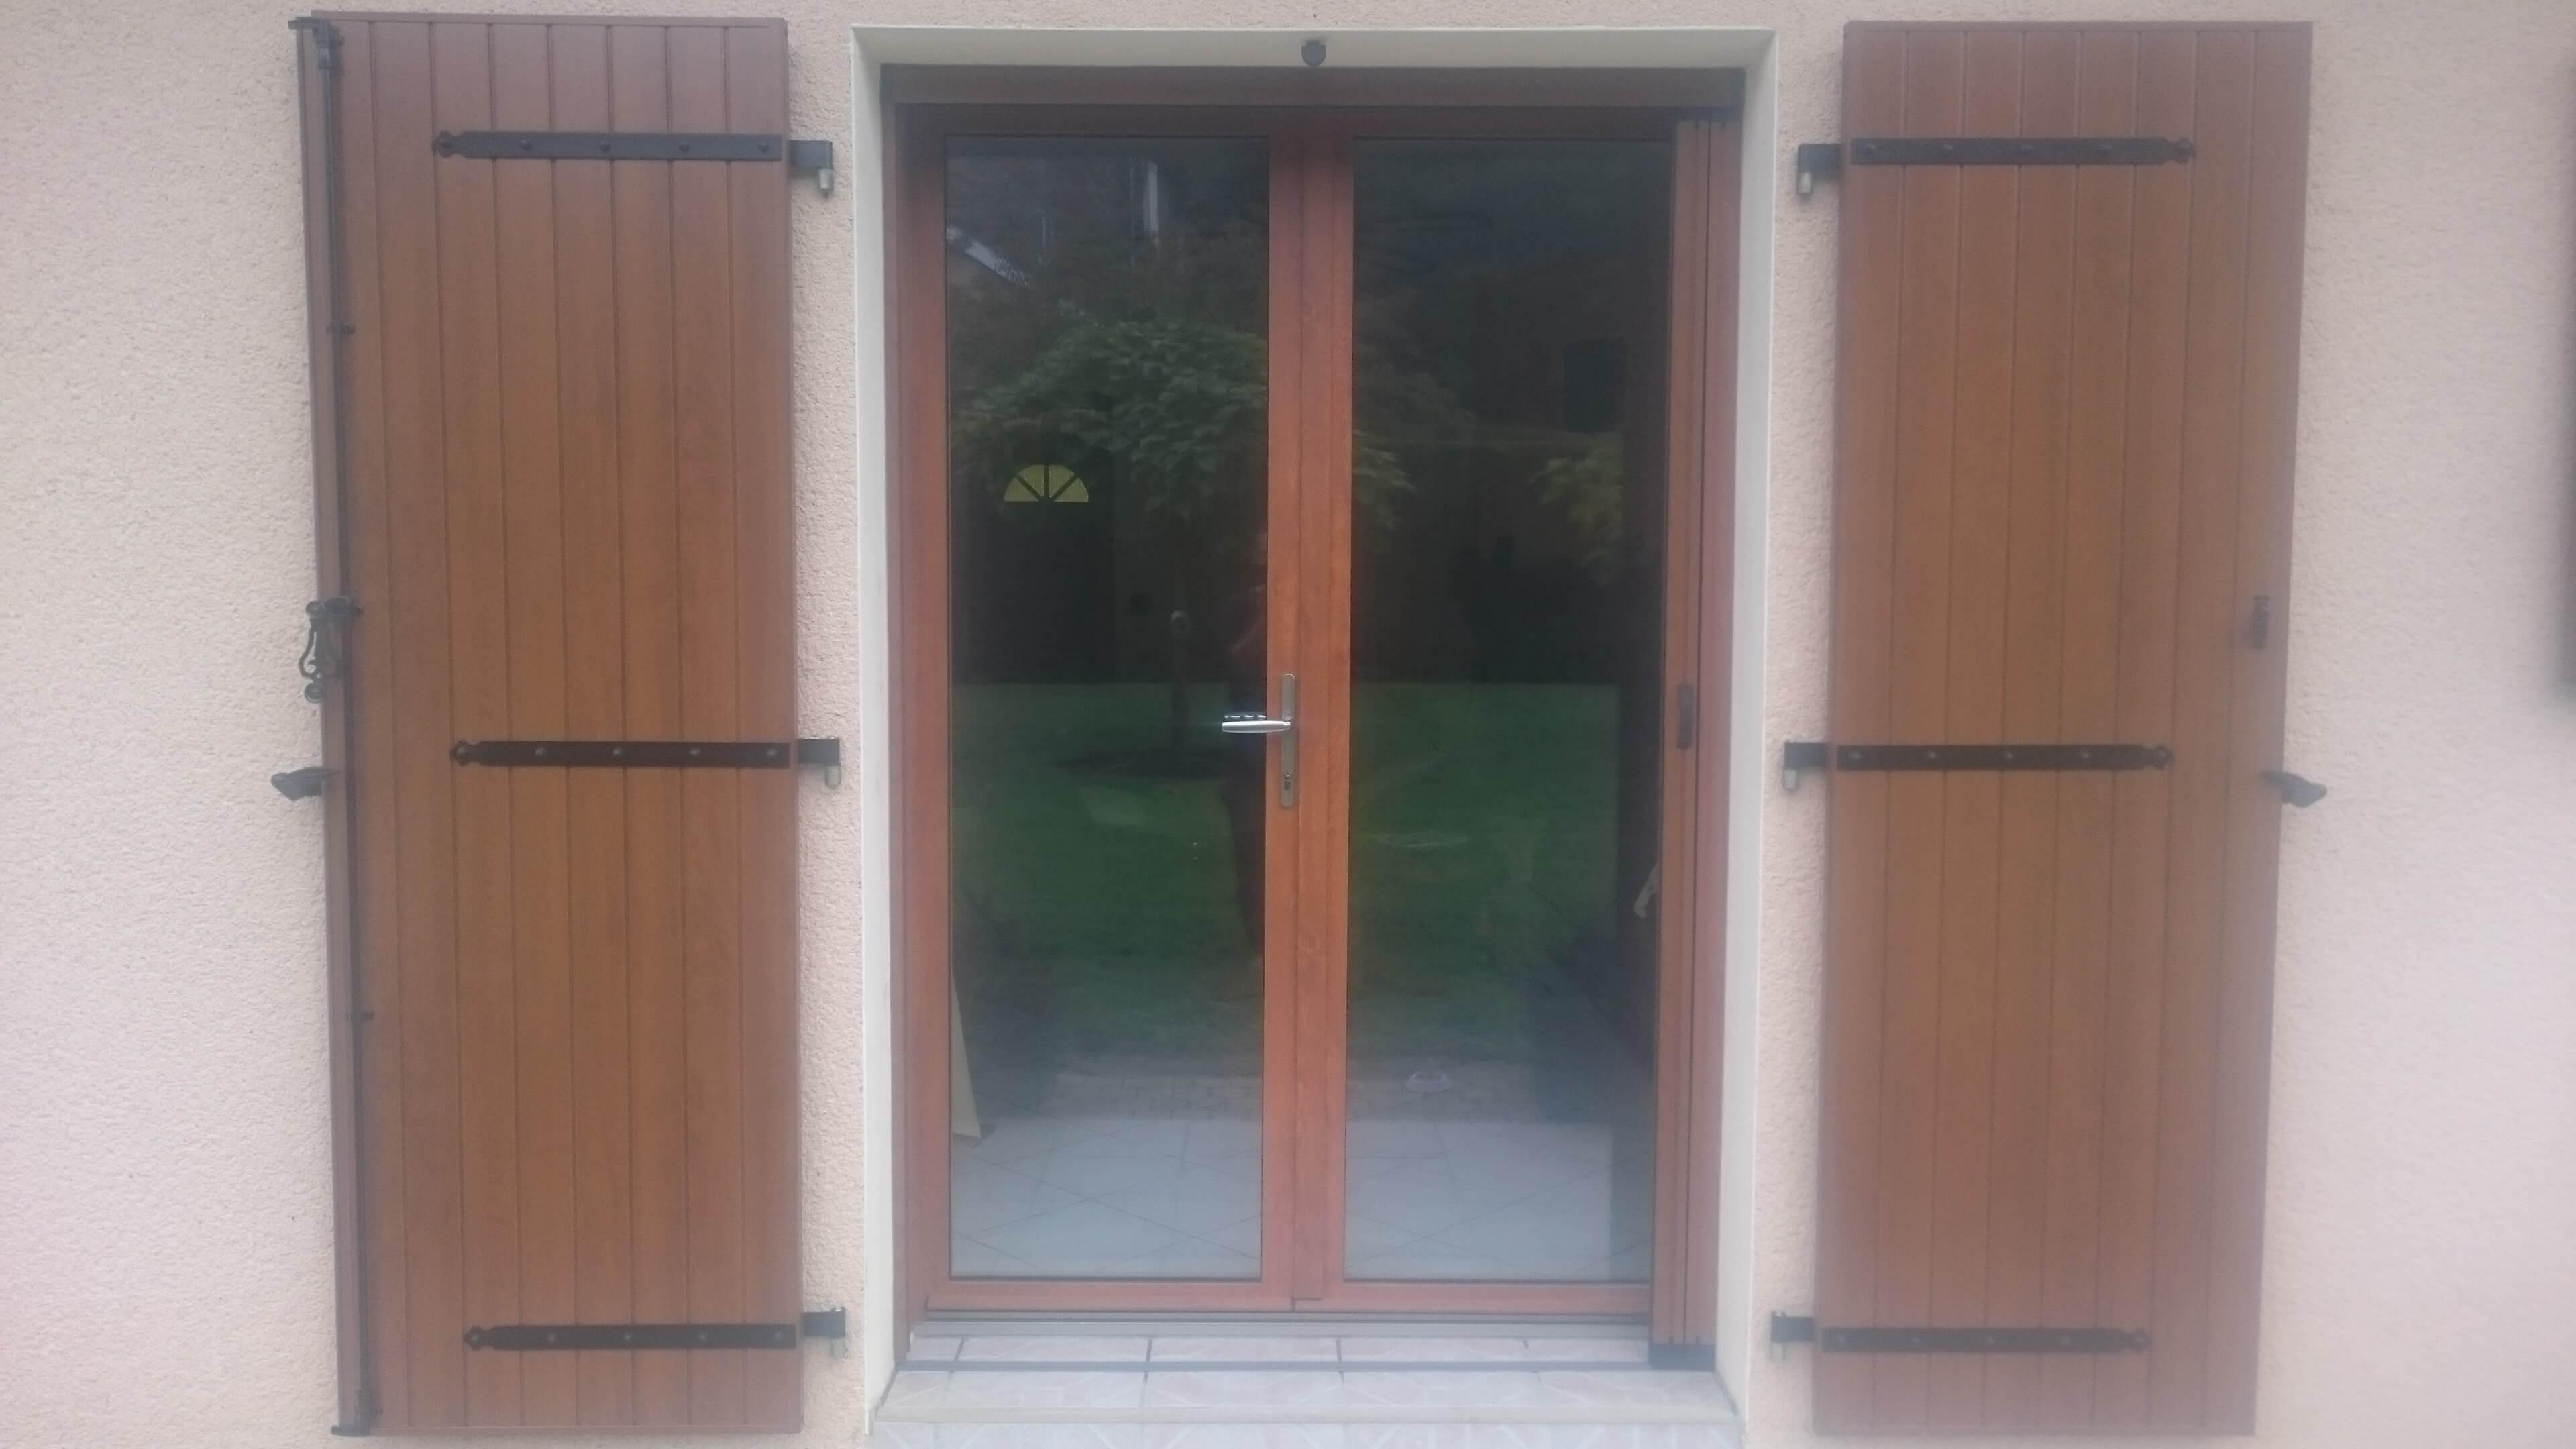 Menuiserie Figard - Fabrication sur mesure - Porte-fenêtre - Bois-aluminium - Vesoul